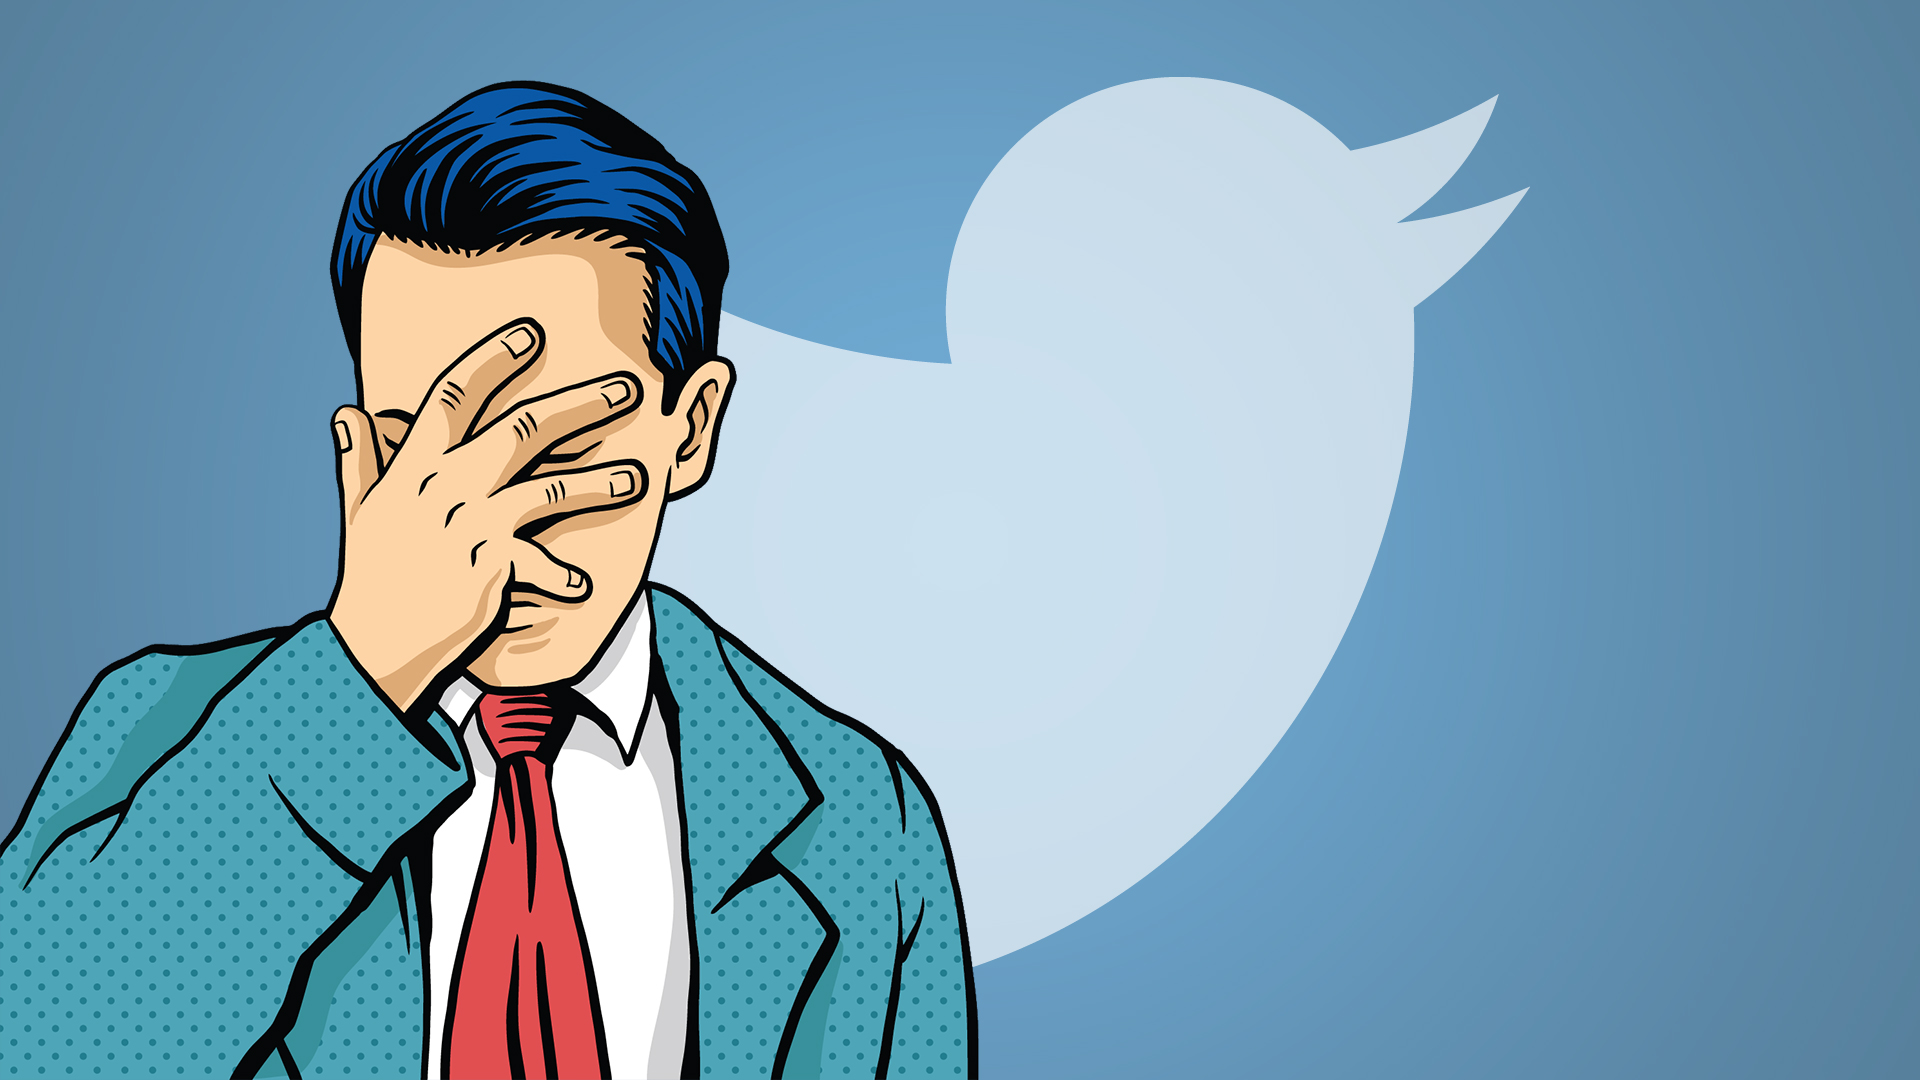 twitter-fail-facepalm-ss-1920